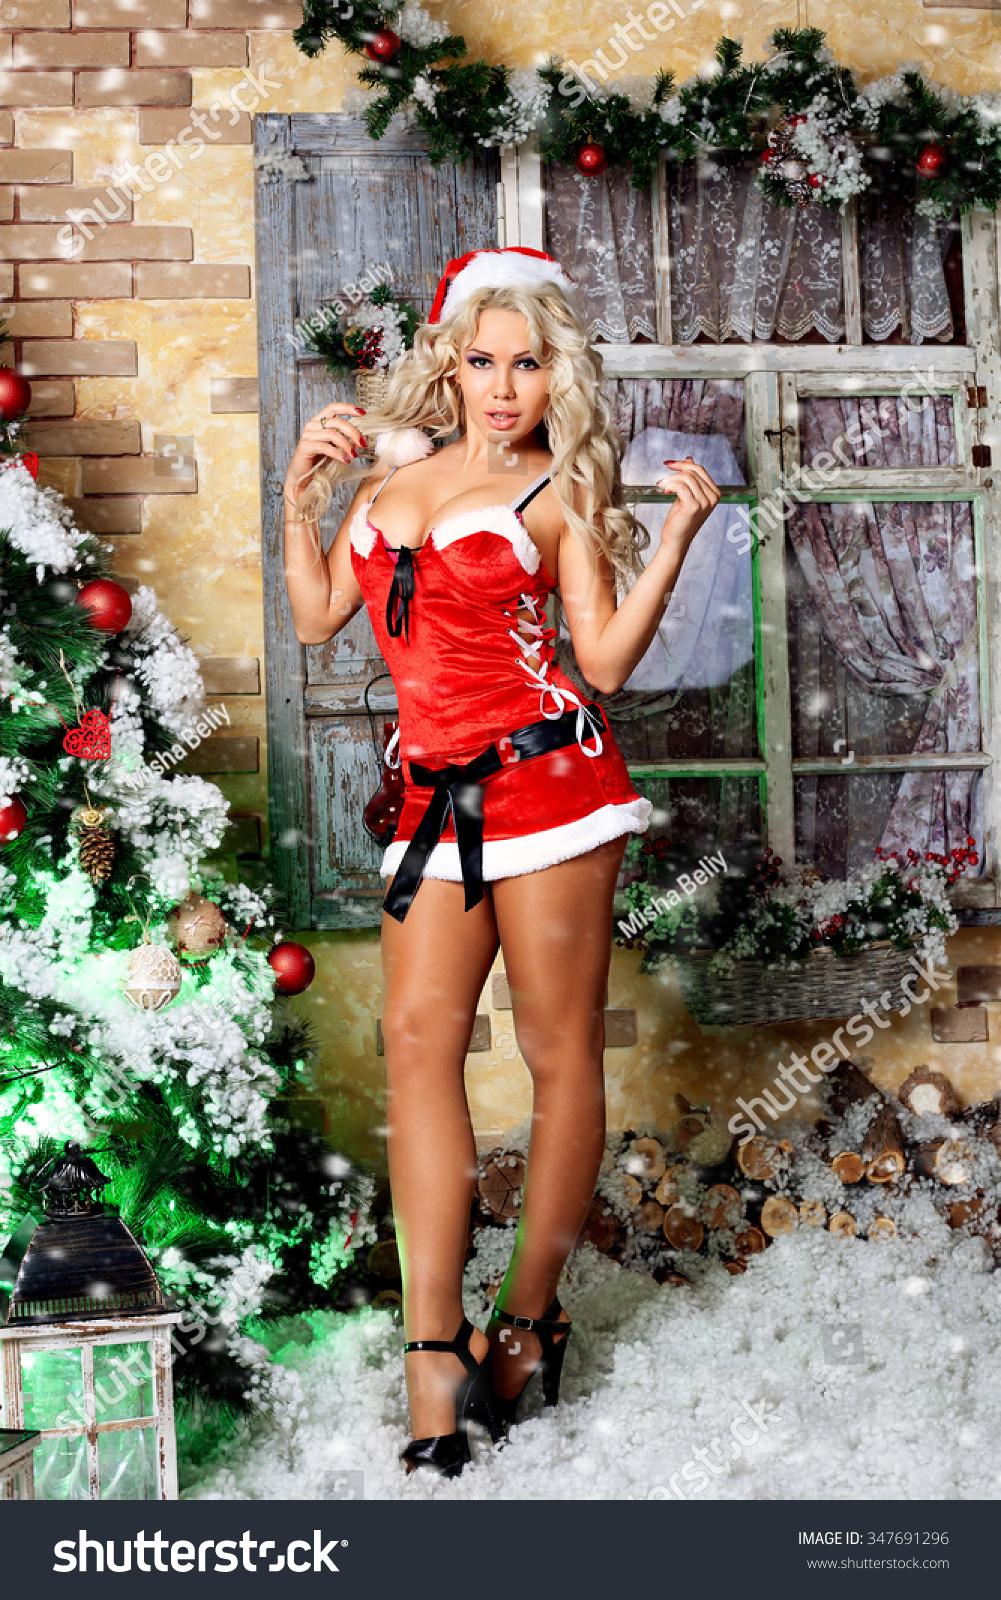 Beautiful sexy blonde female lush breasts model snowflake dressed Santa  Claus erotic red lingerie white fur